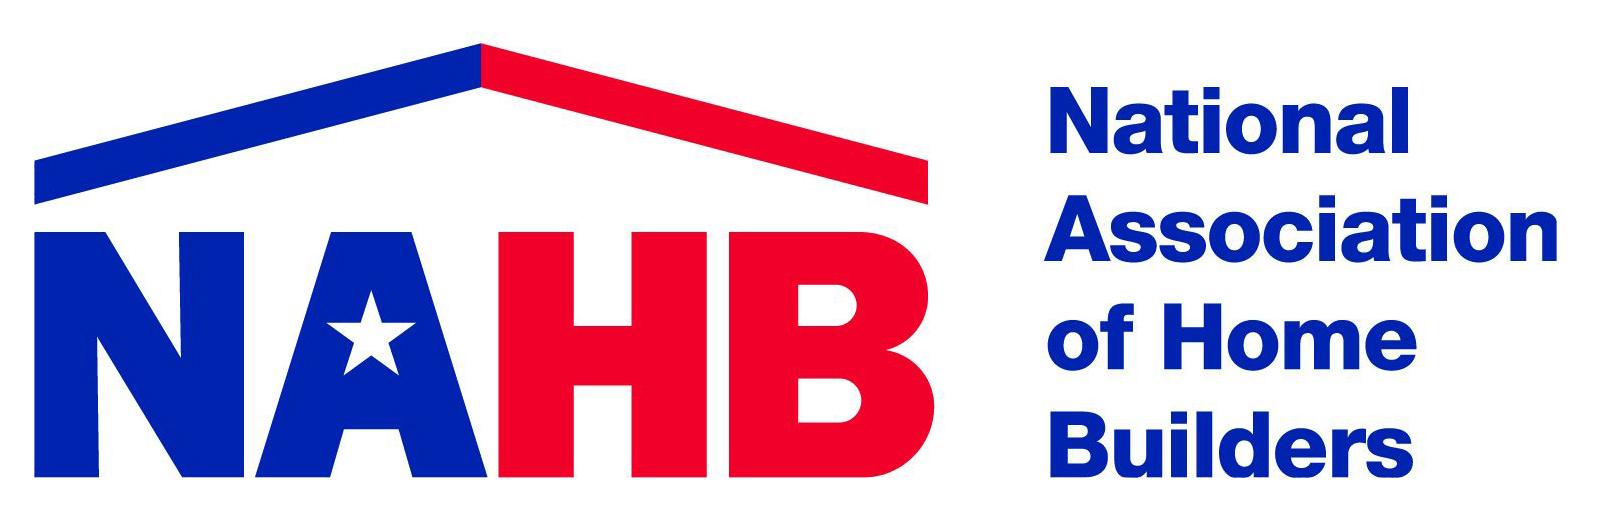 NAHB-Color-Logo.jpg